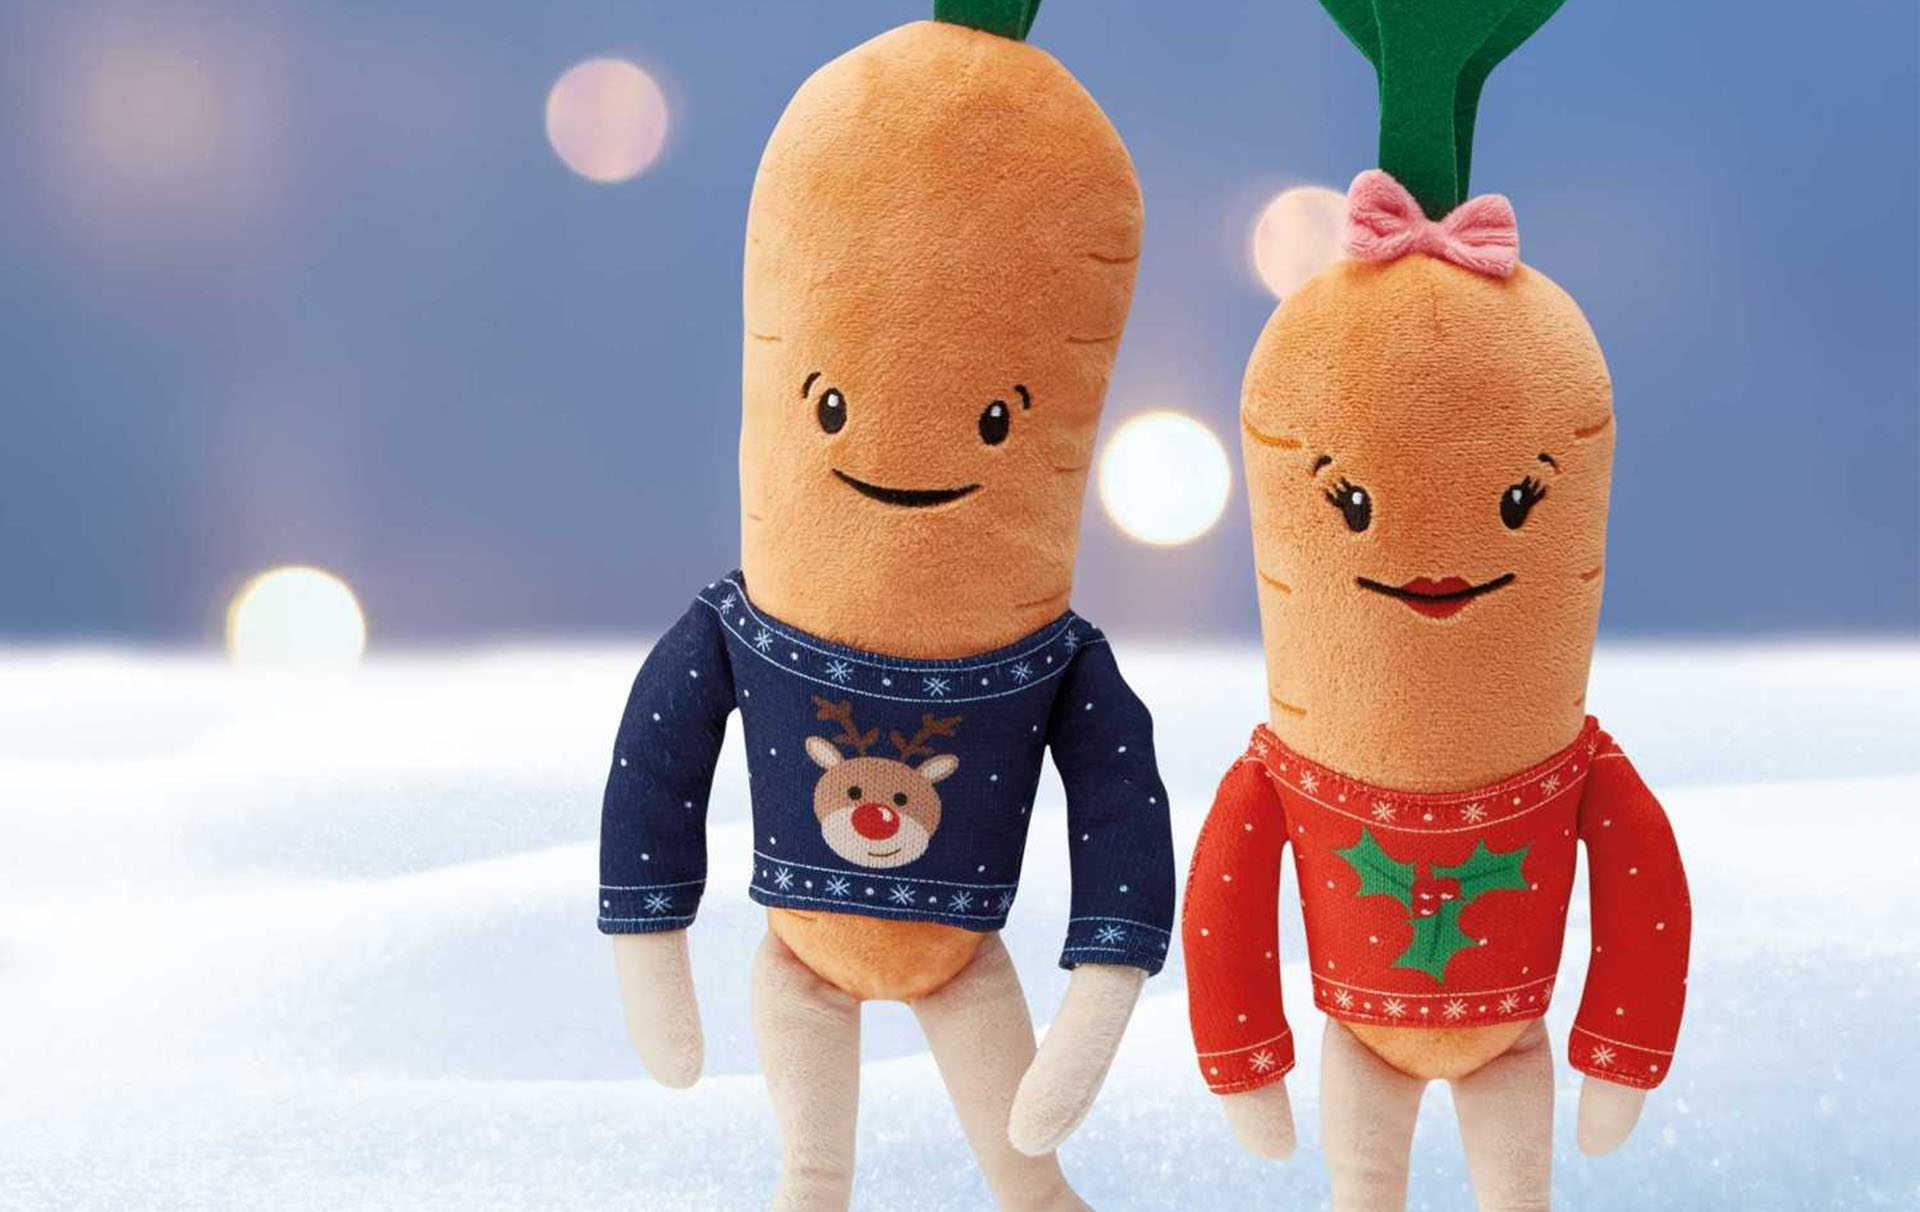 Parents complain about Aldi's Kevin the Carrot